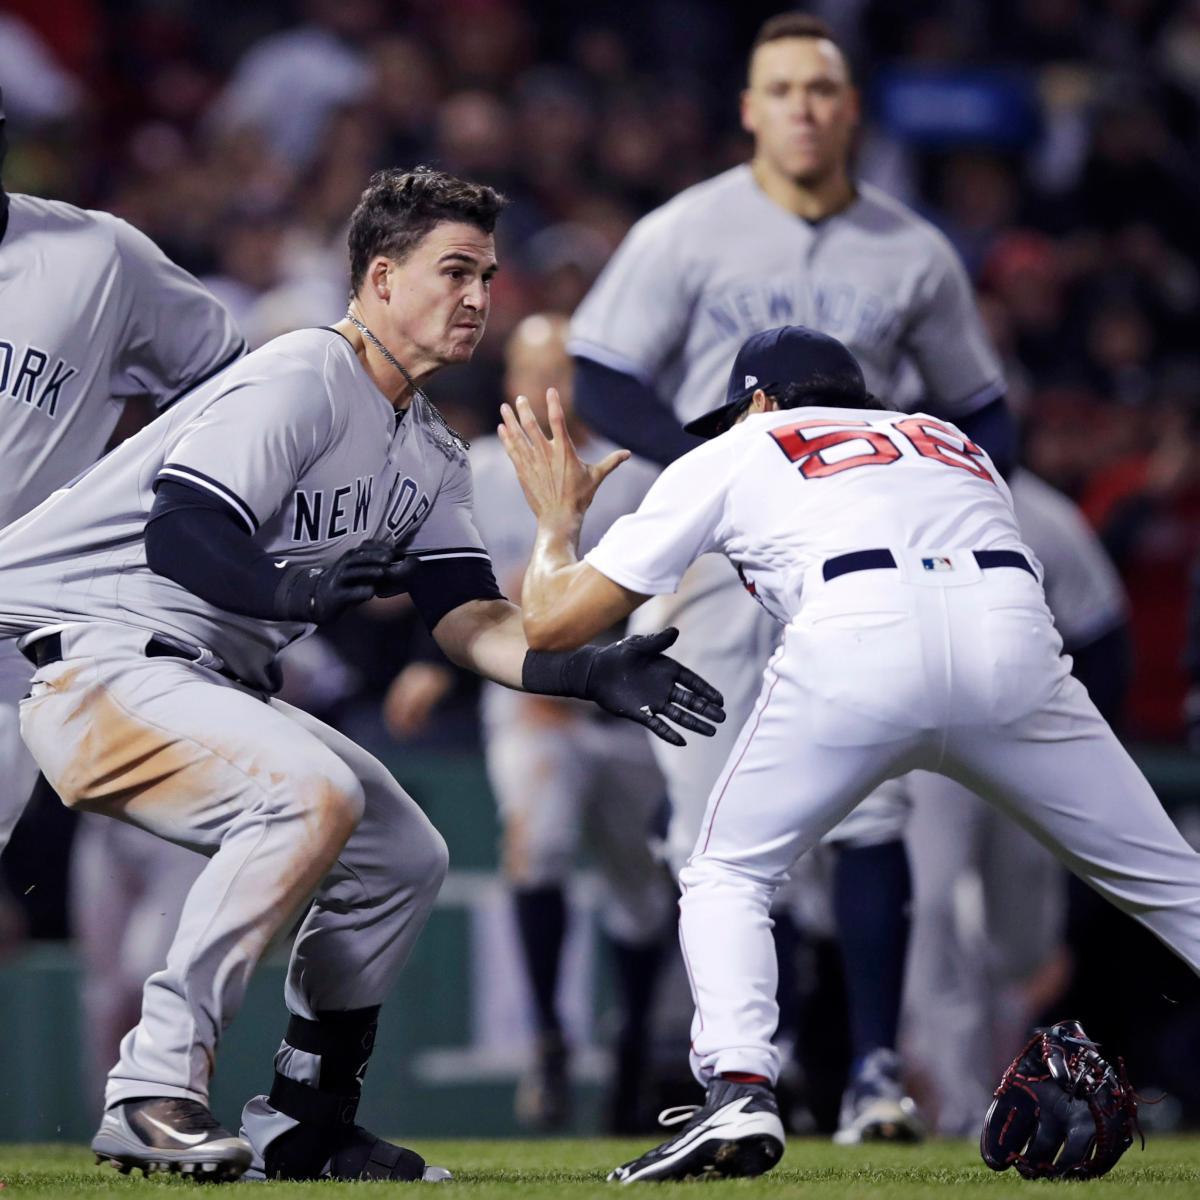 Joe Kelly Suspended 5 Games, Tyler Austin 6 for Red Sox vs. Yankees Brawl